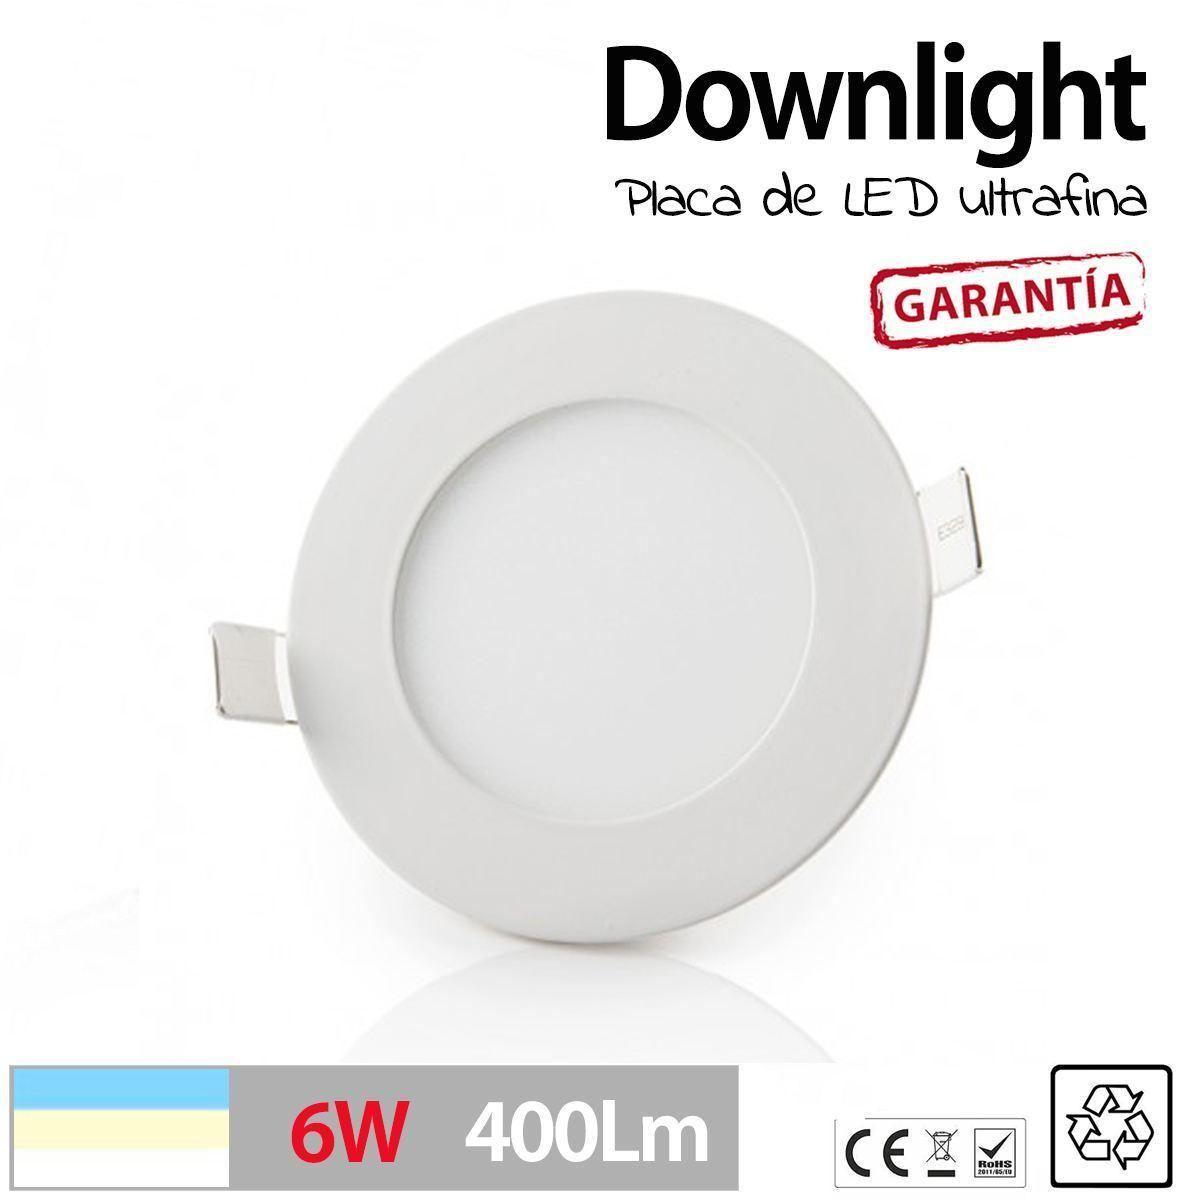 Downlight-LED-SLIM-Redondo-Extraplano-6W-para-Interior-Luz-Techo-plafon-LED